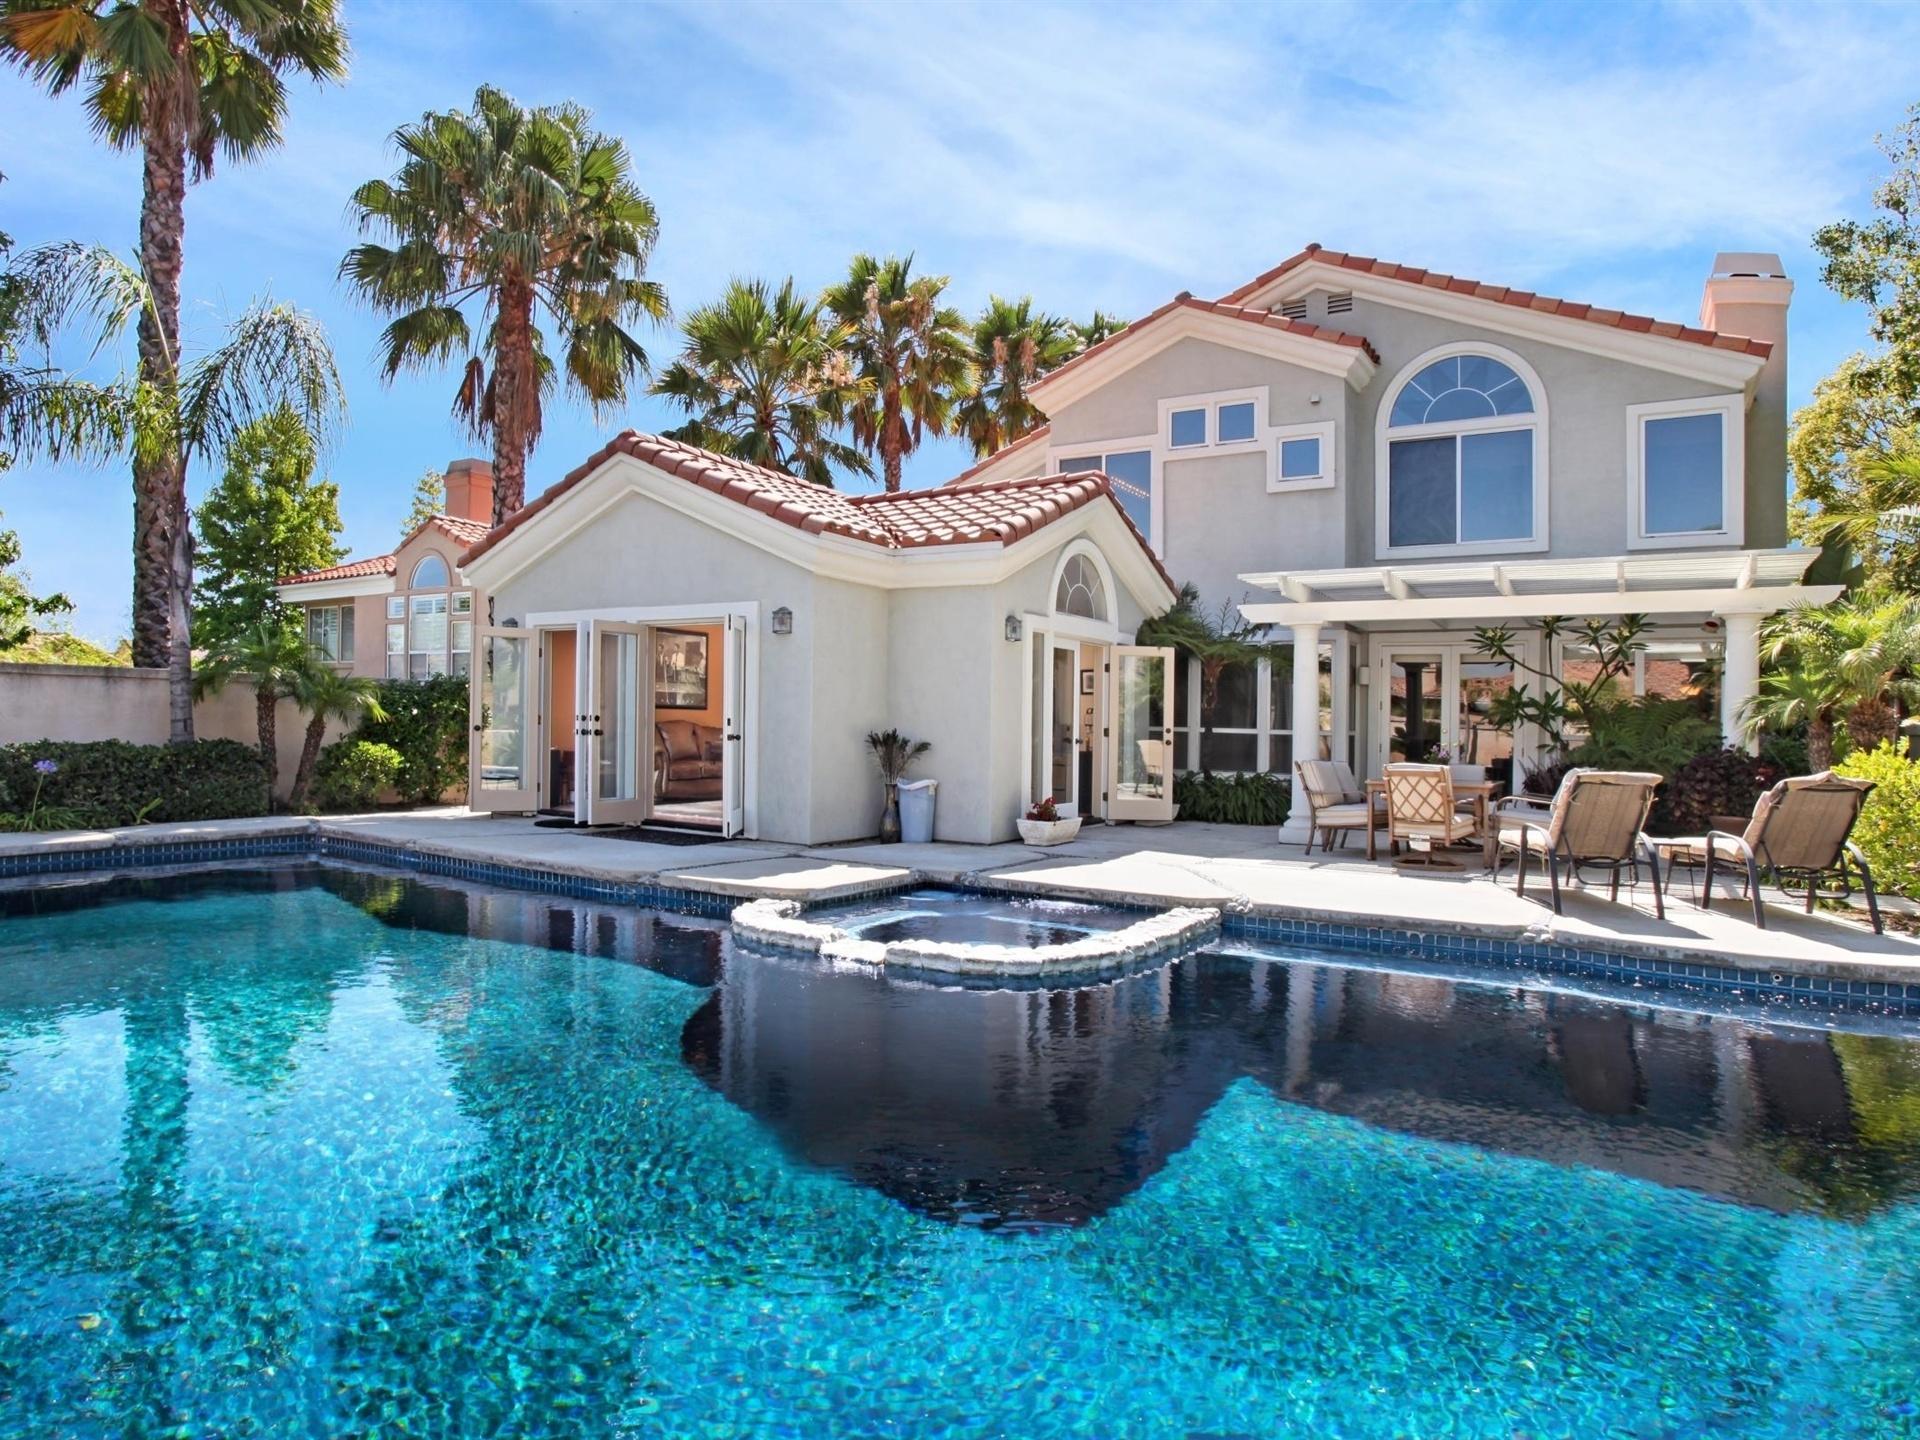 Villa Haus Palmen und Swimming-Pool 750x1334 iPhone 8/7/6/6S ...